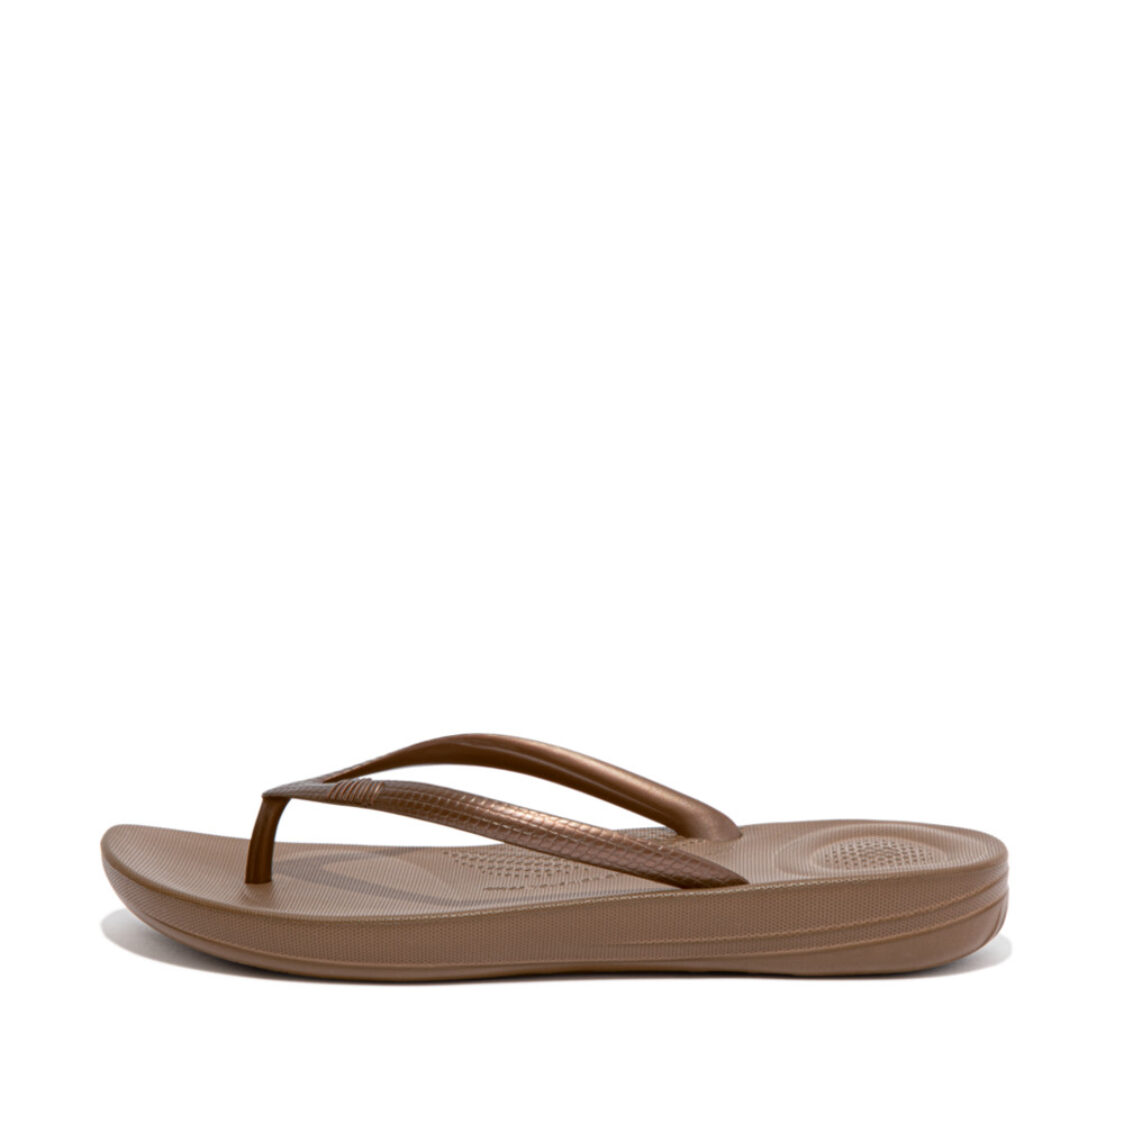 Fitflop Iquishion Ergonomic Flip-flops Bronze E54-012